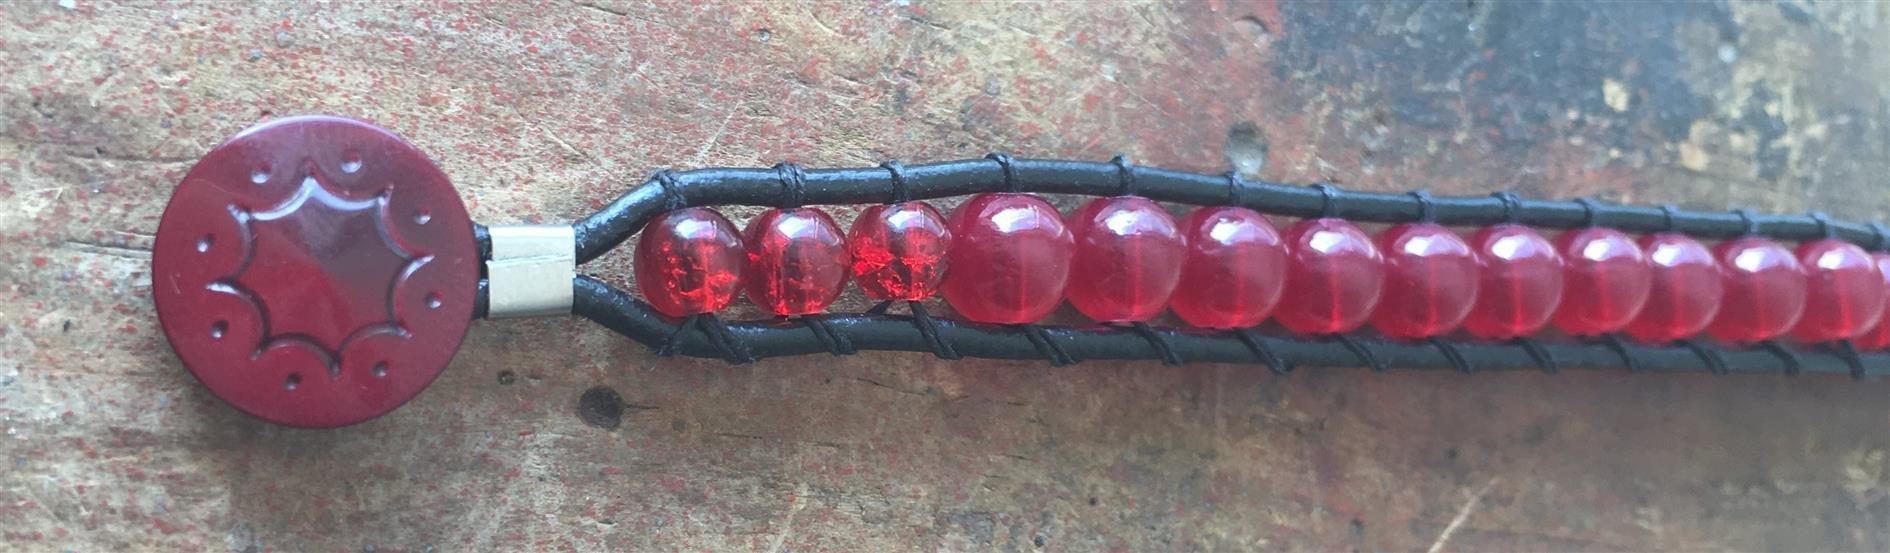 Leather Wrap Bracelet Red Glass Beads